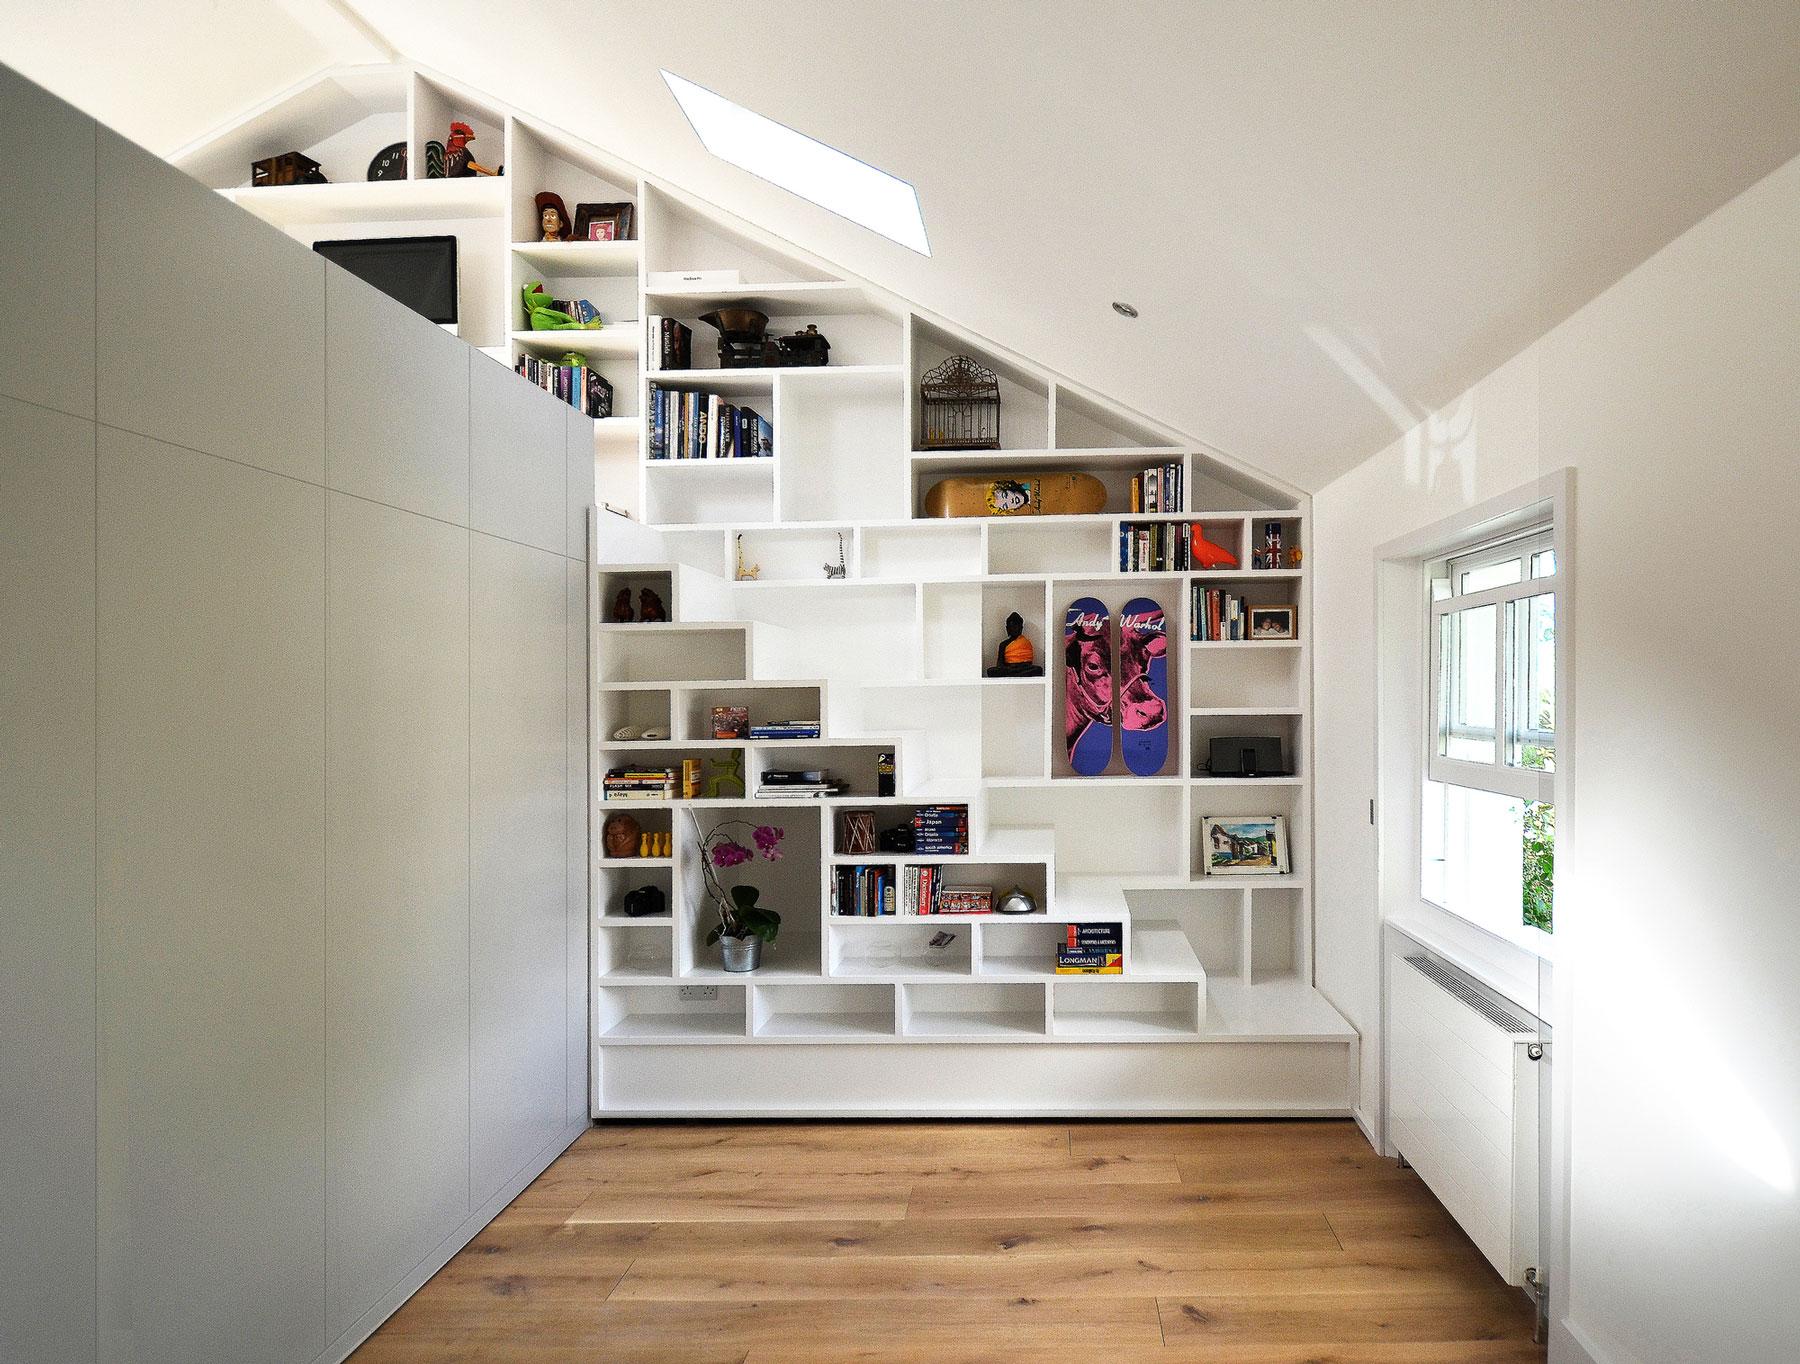 loft-space-in-camden-08